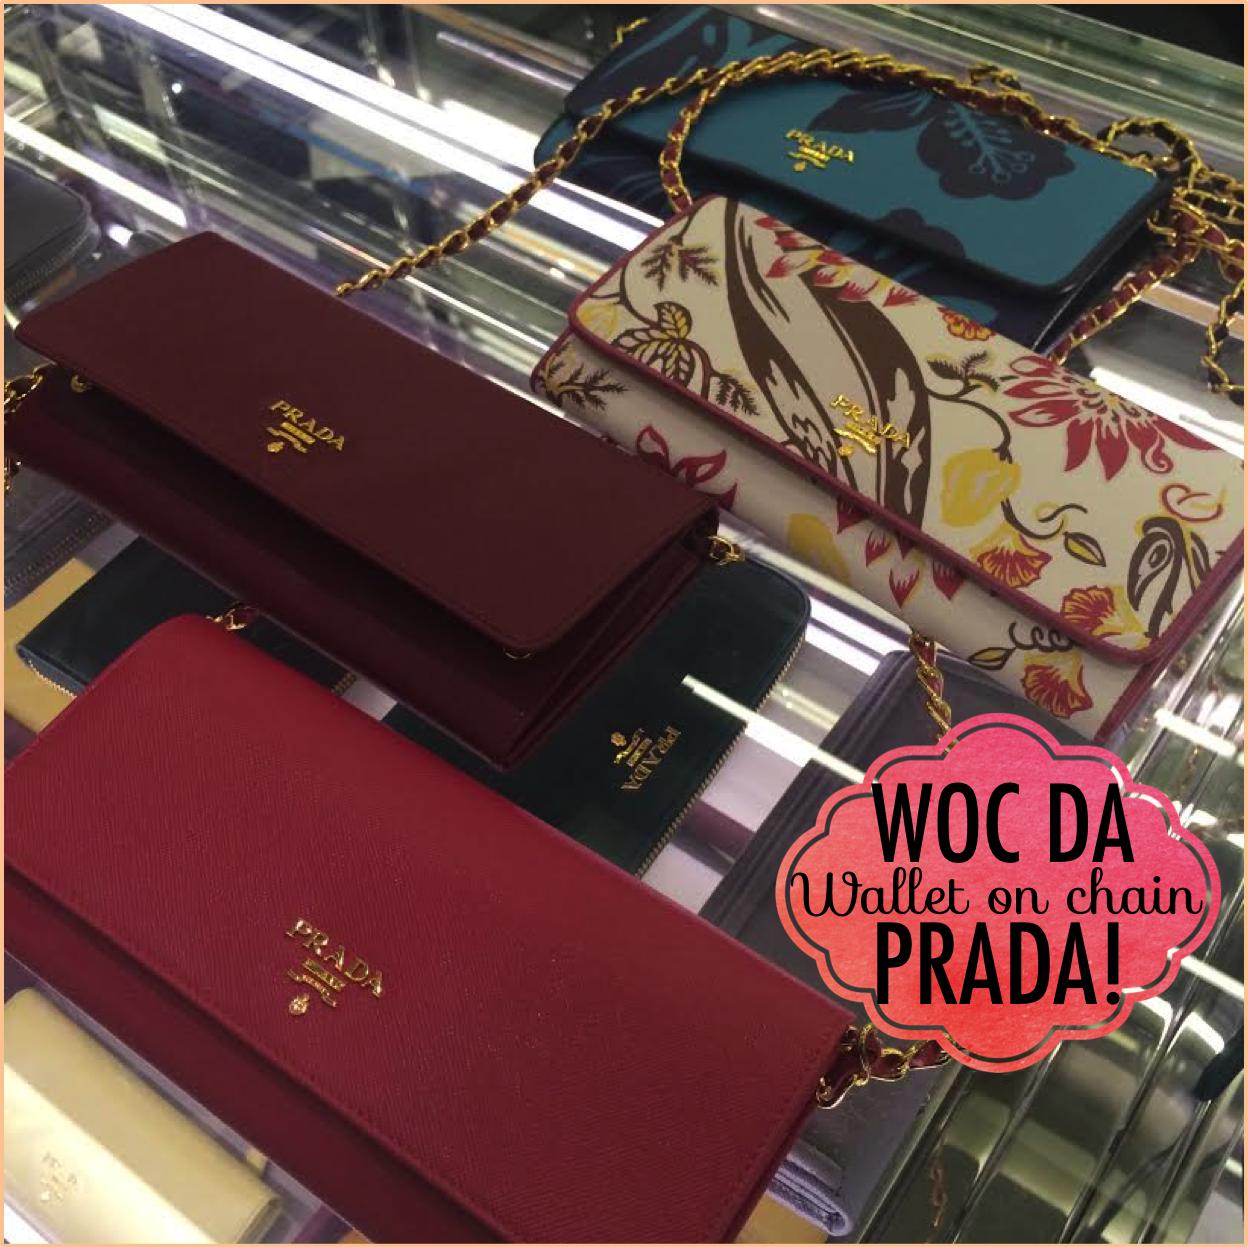 preço bolsa prada village mall wallet